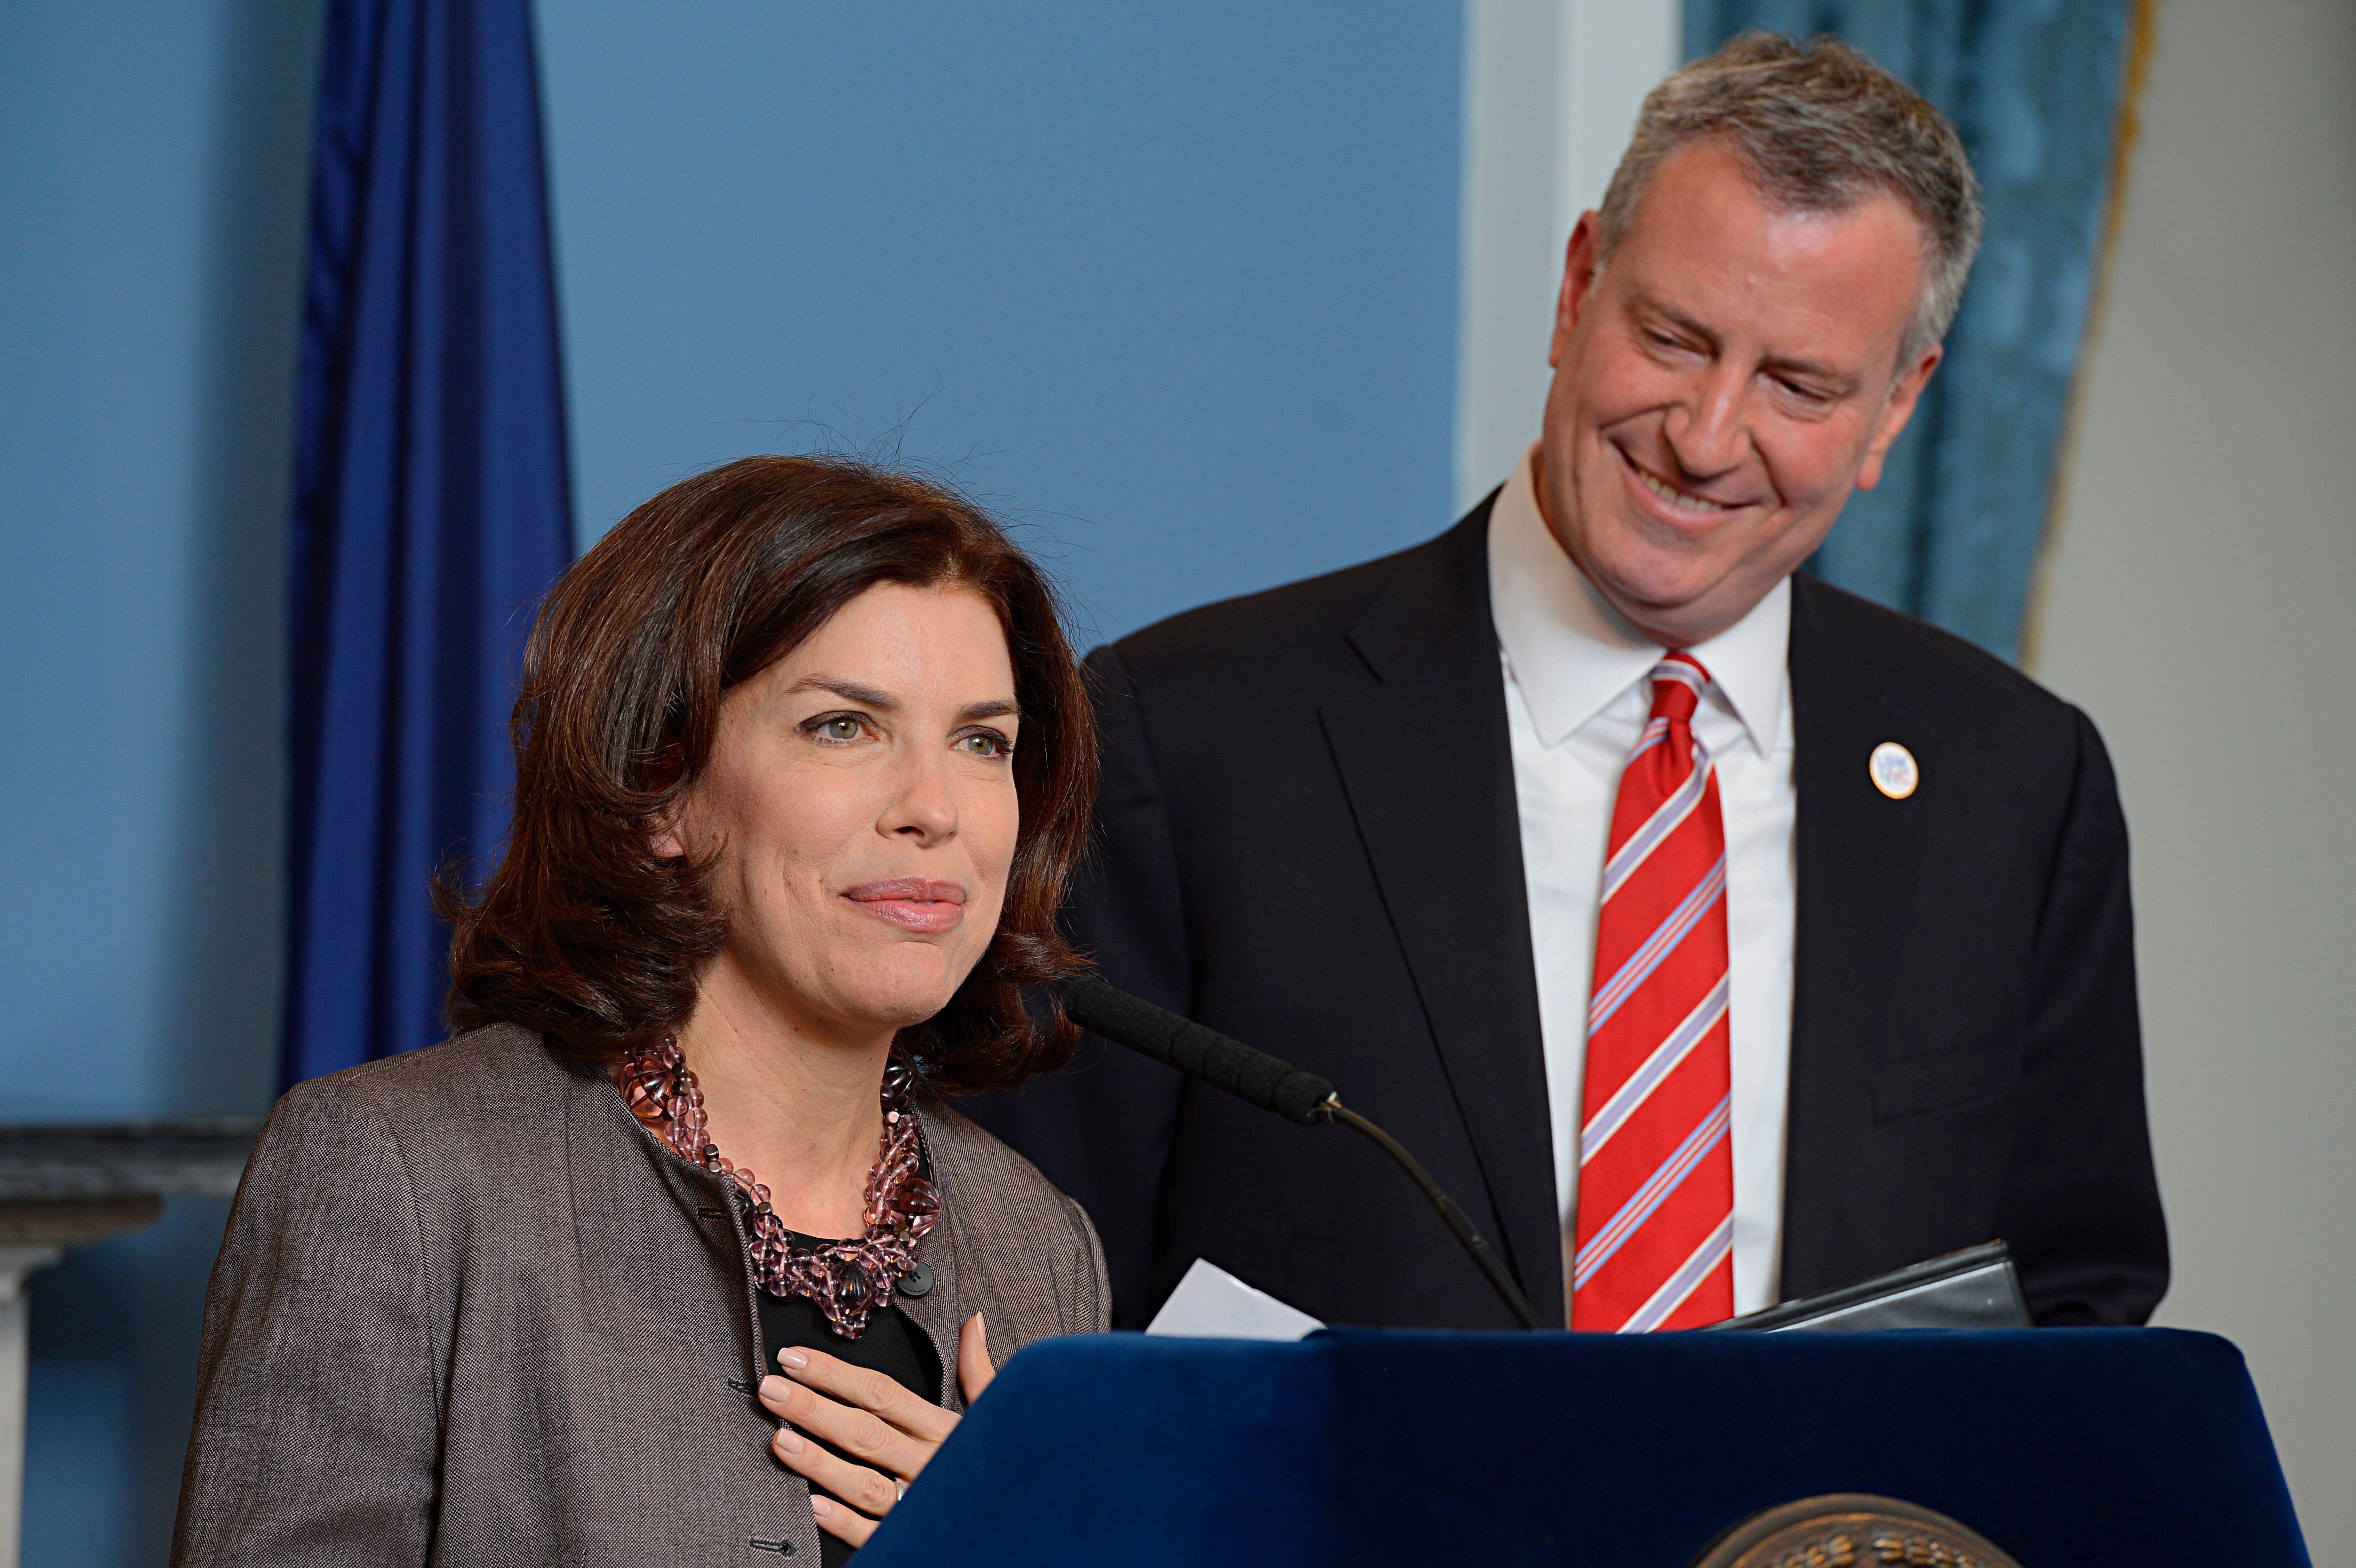 Mayor Bill de Blasio and Julie Menin